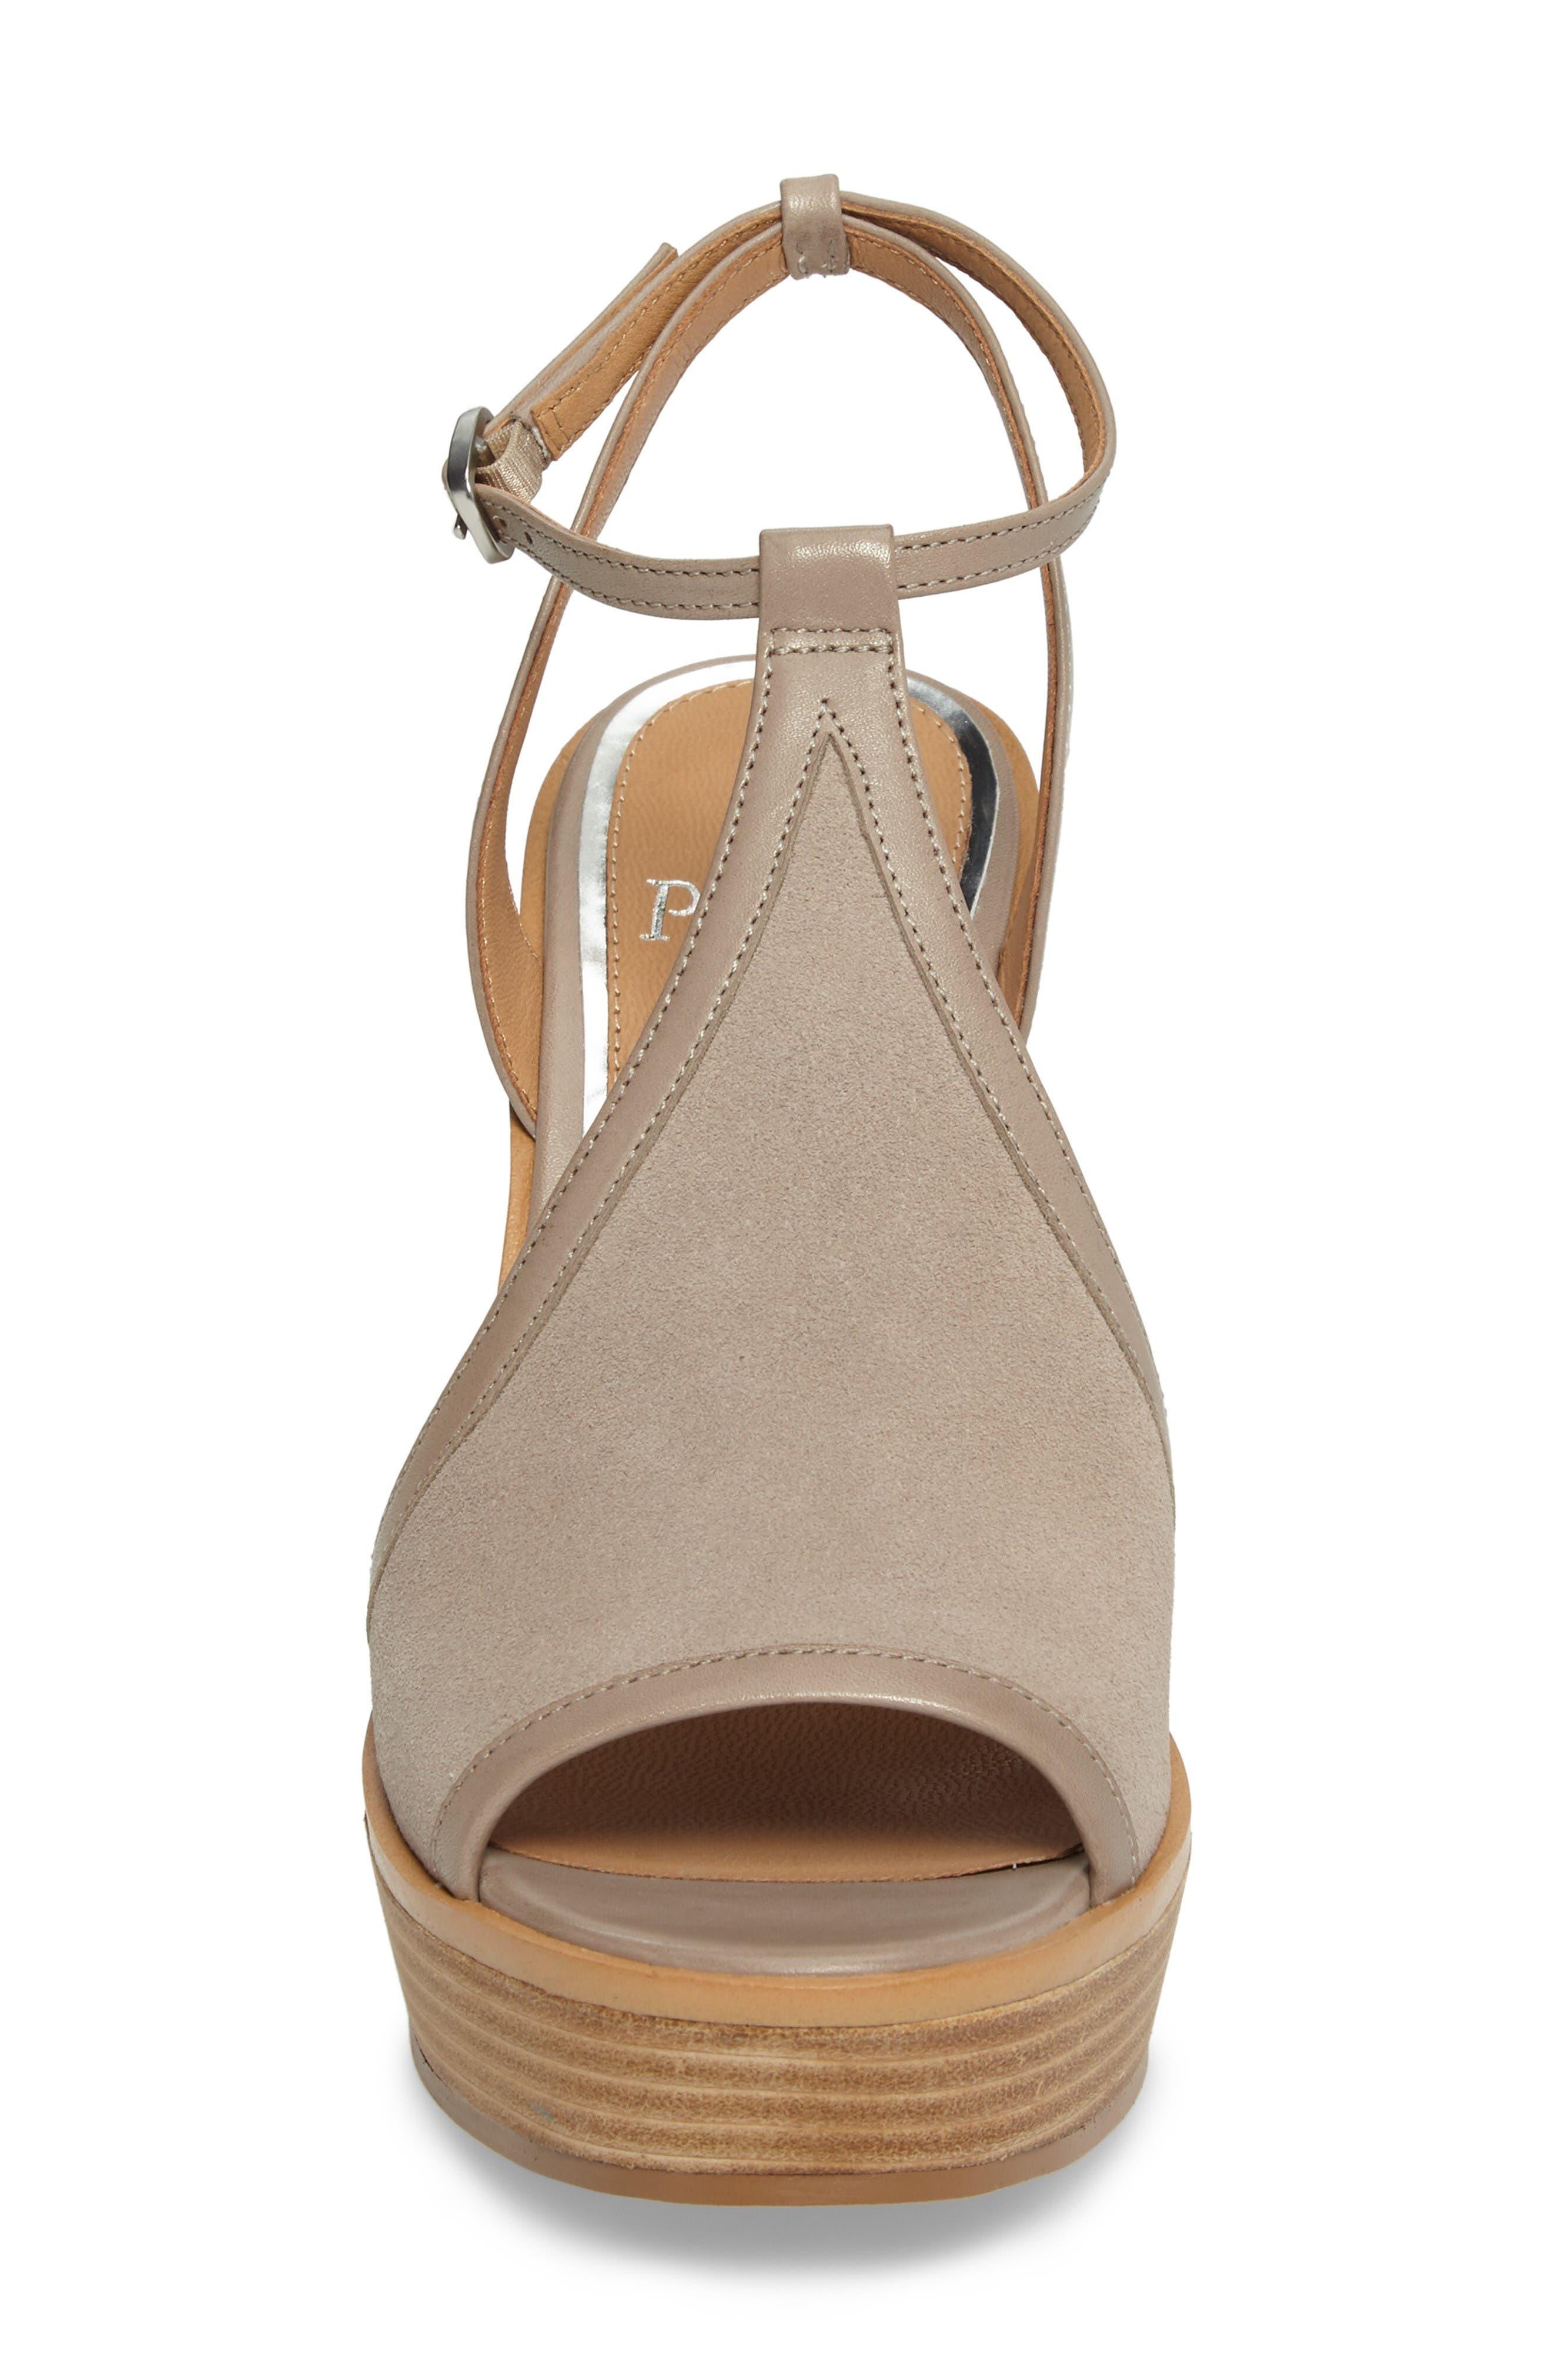 India T-Strap Platform Sandal,                             Alternate thumbnail 4, color,                             Rock Suede